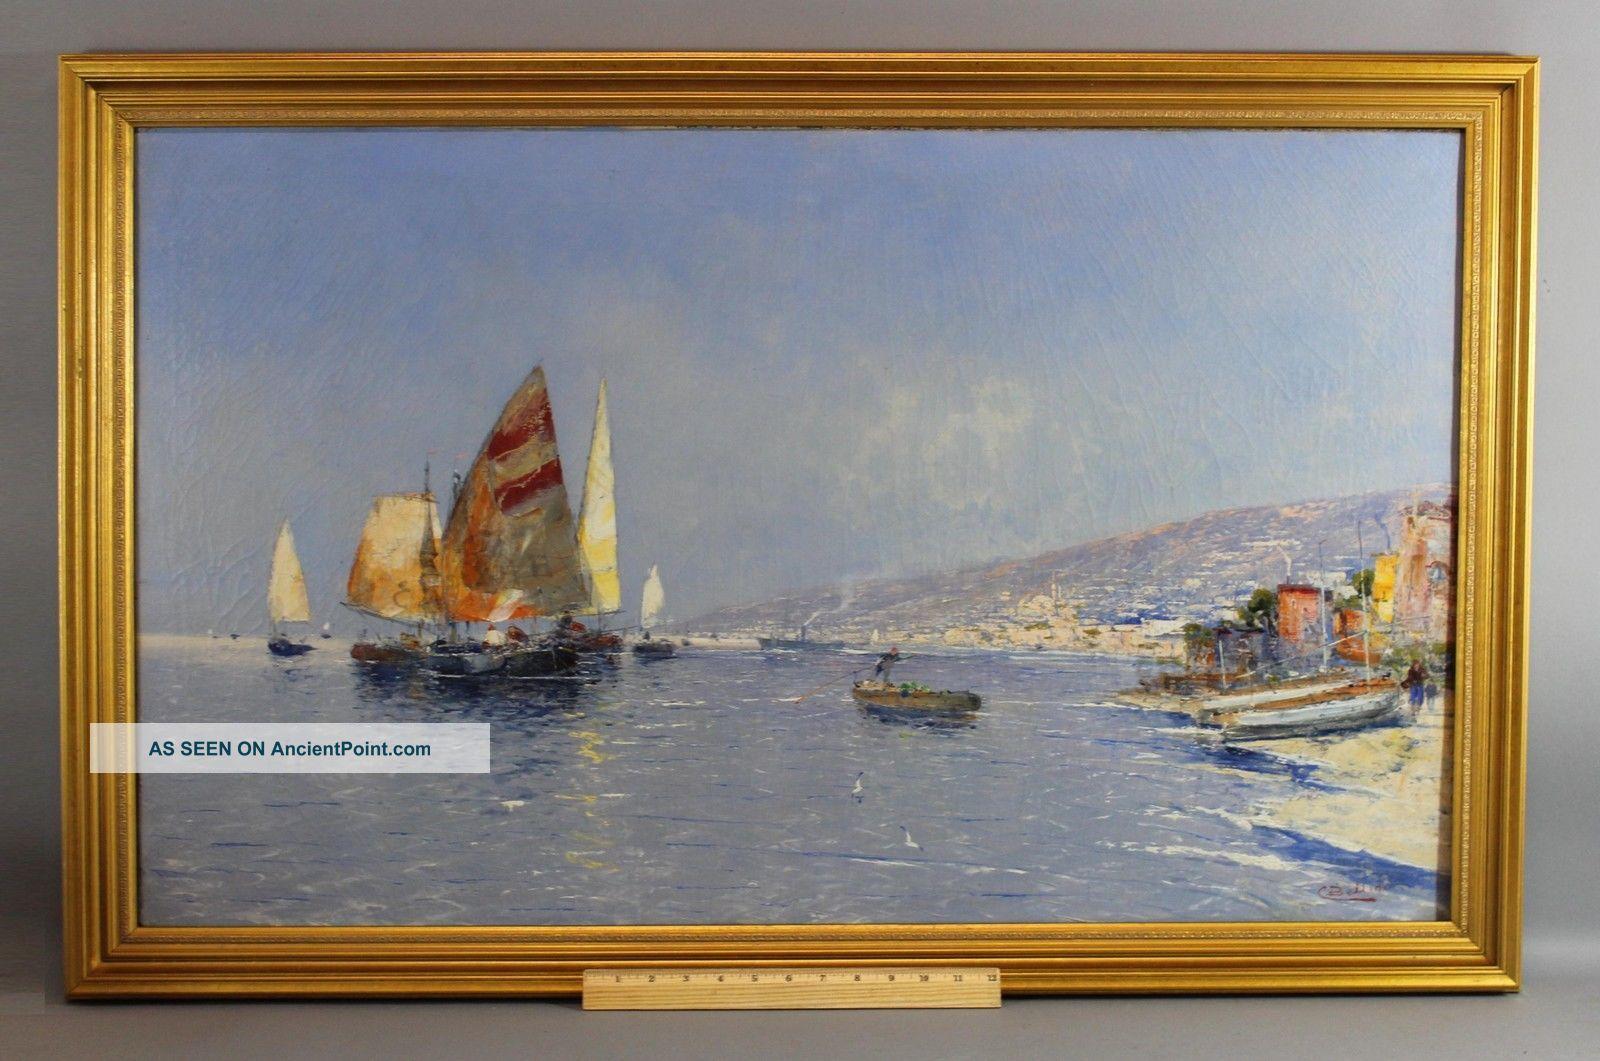 Lg Antique C Bellini Italian Impressionist Sailboat Harbor Seascape Oil Painting Other Maritime Antiques photo